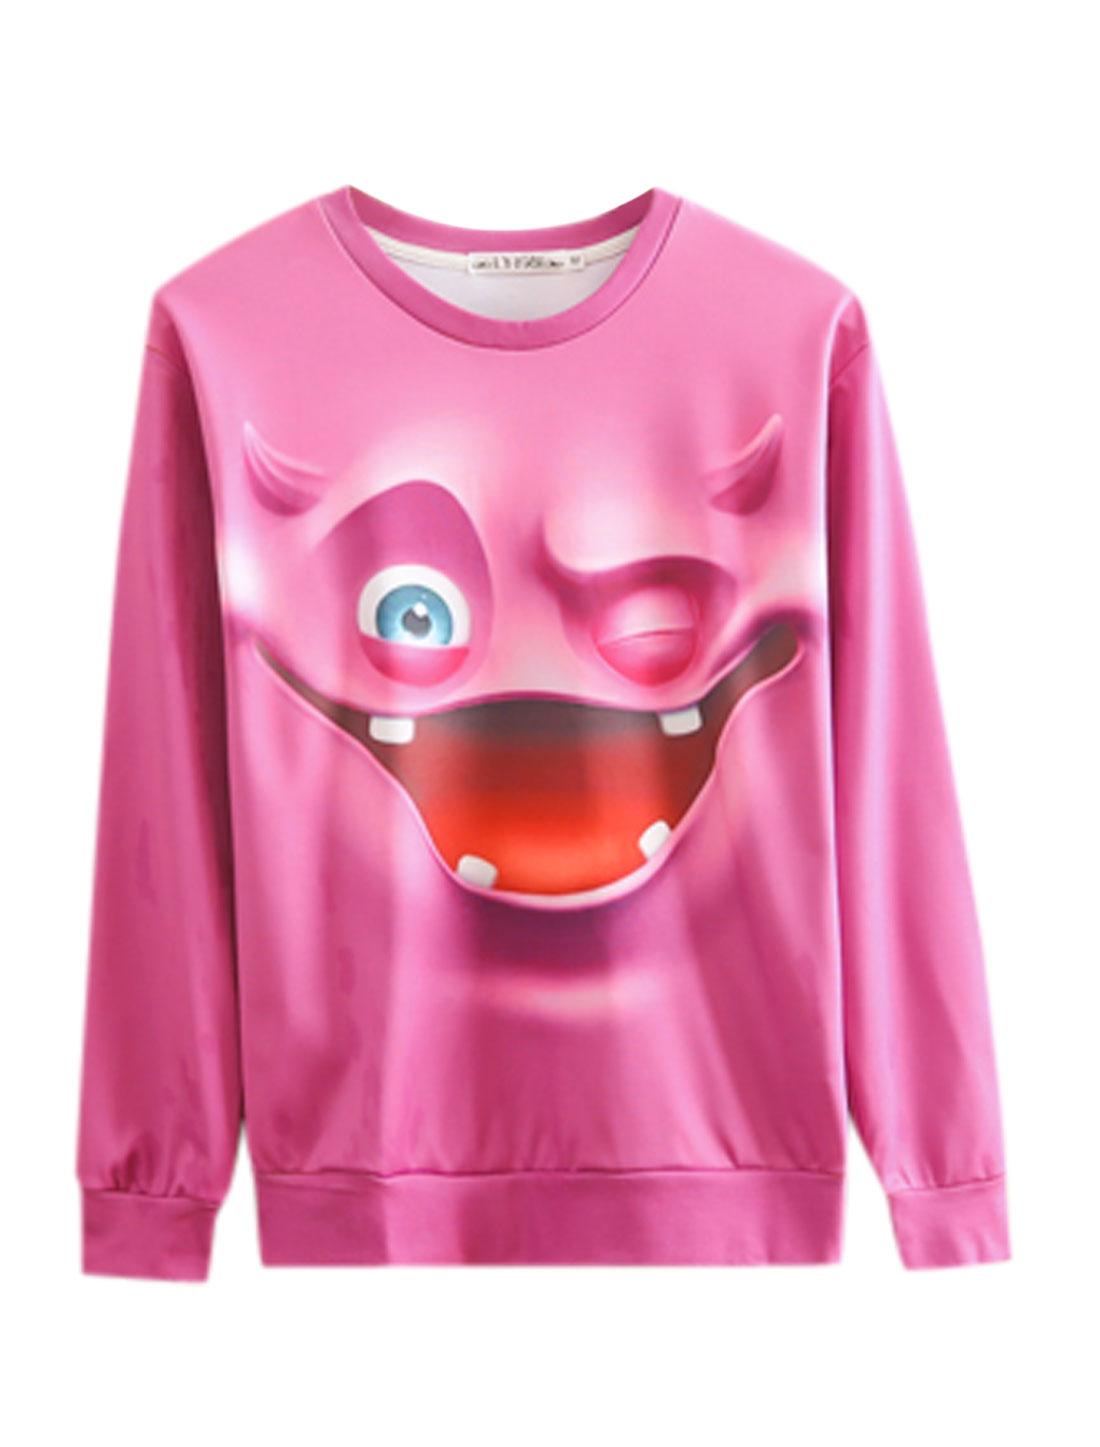 Round Neck Cartoon Pattern Slipover NEW Sweatshirt for Men Fuchsia M